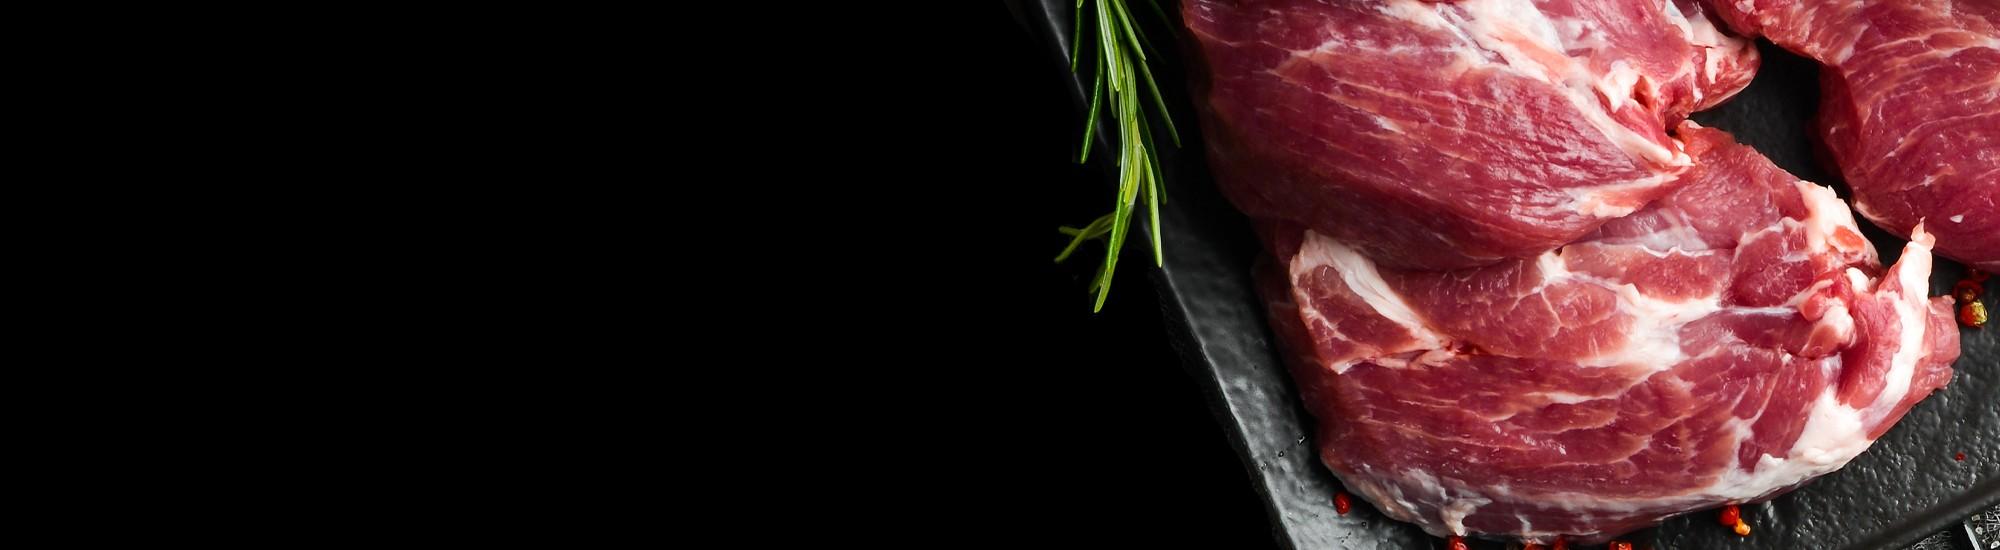 Delikatna wołowina